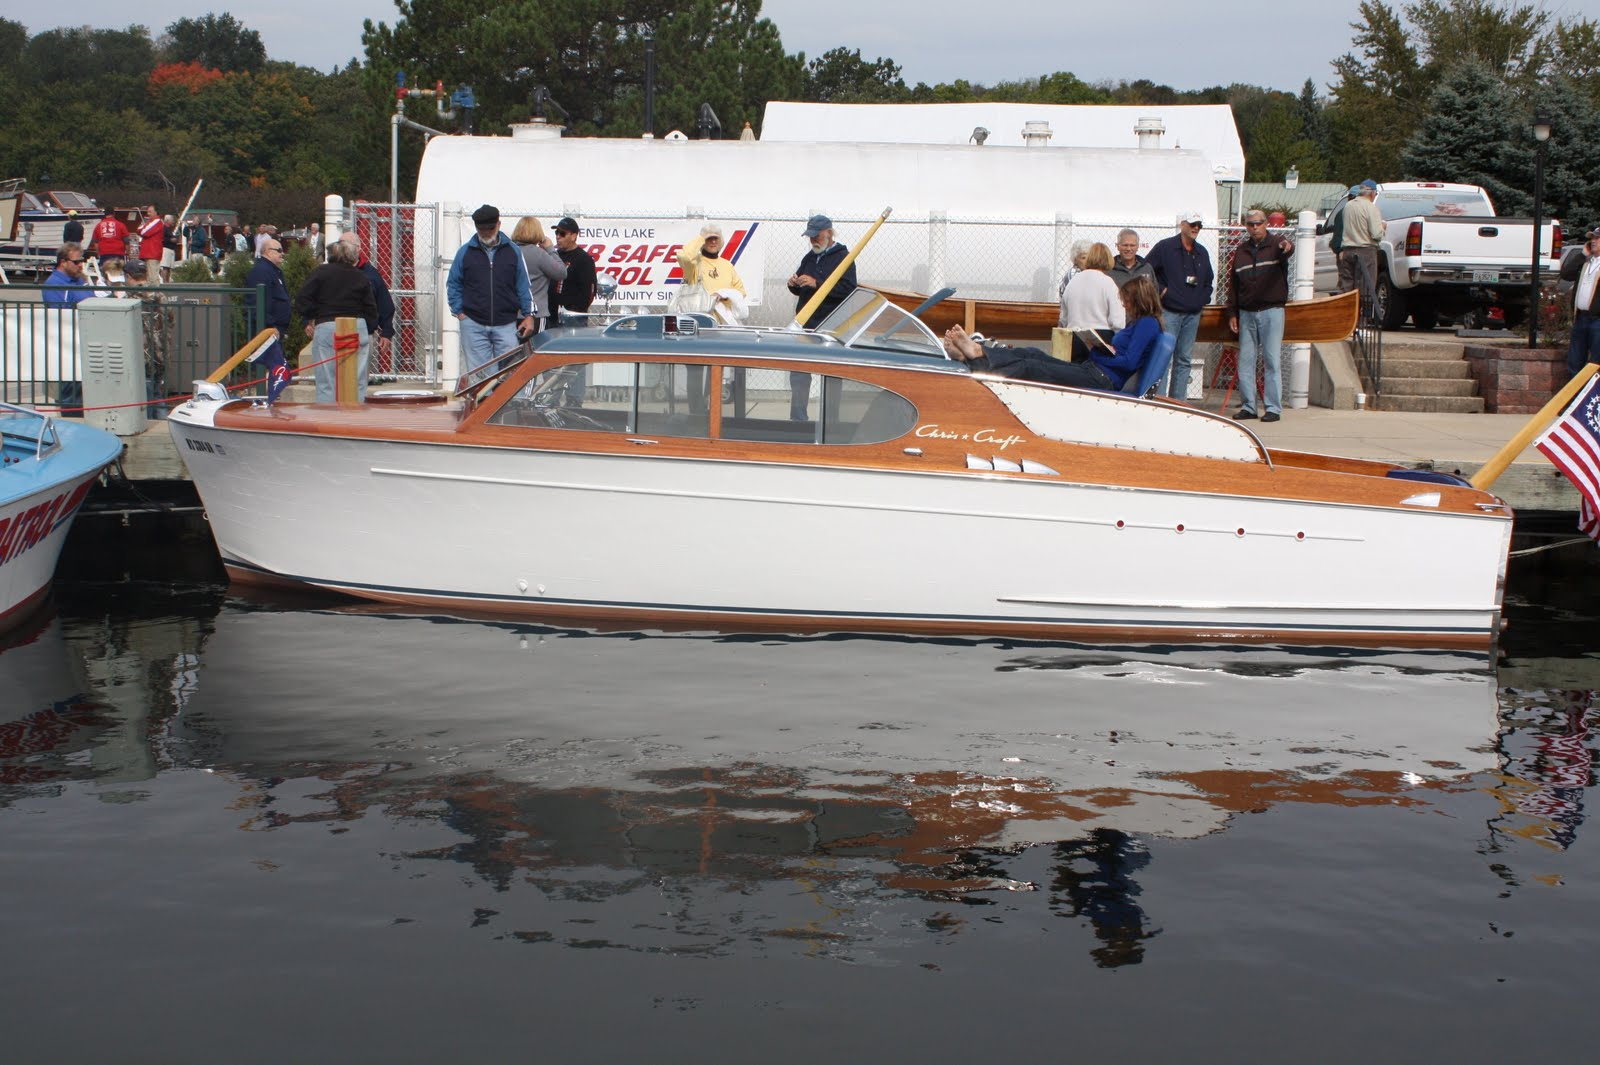 2010 Geneva Lakes Antique & Classic Boat Show – Sunday Encore